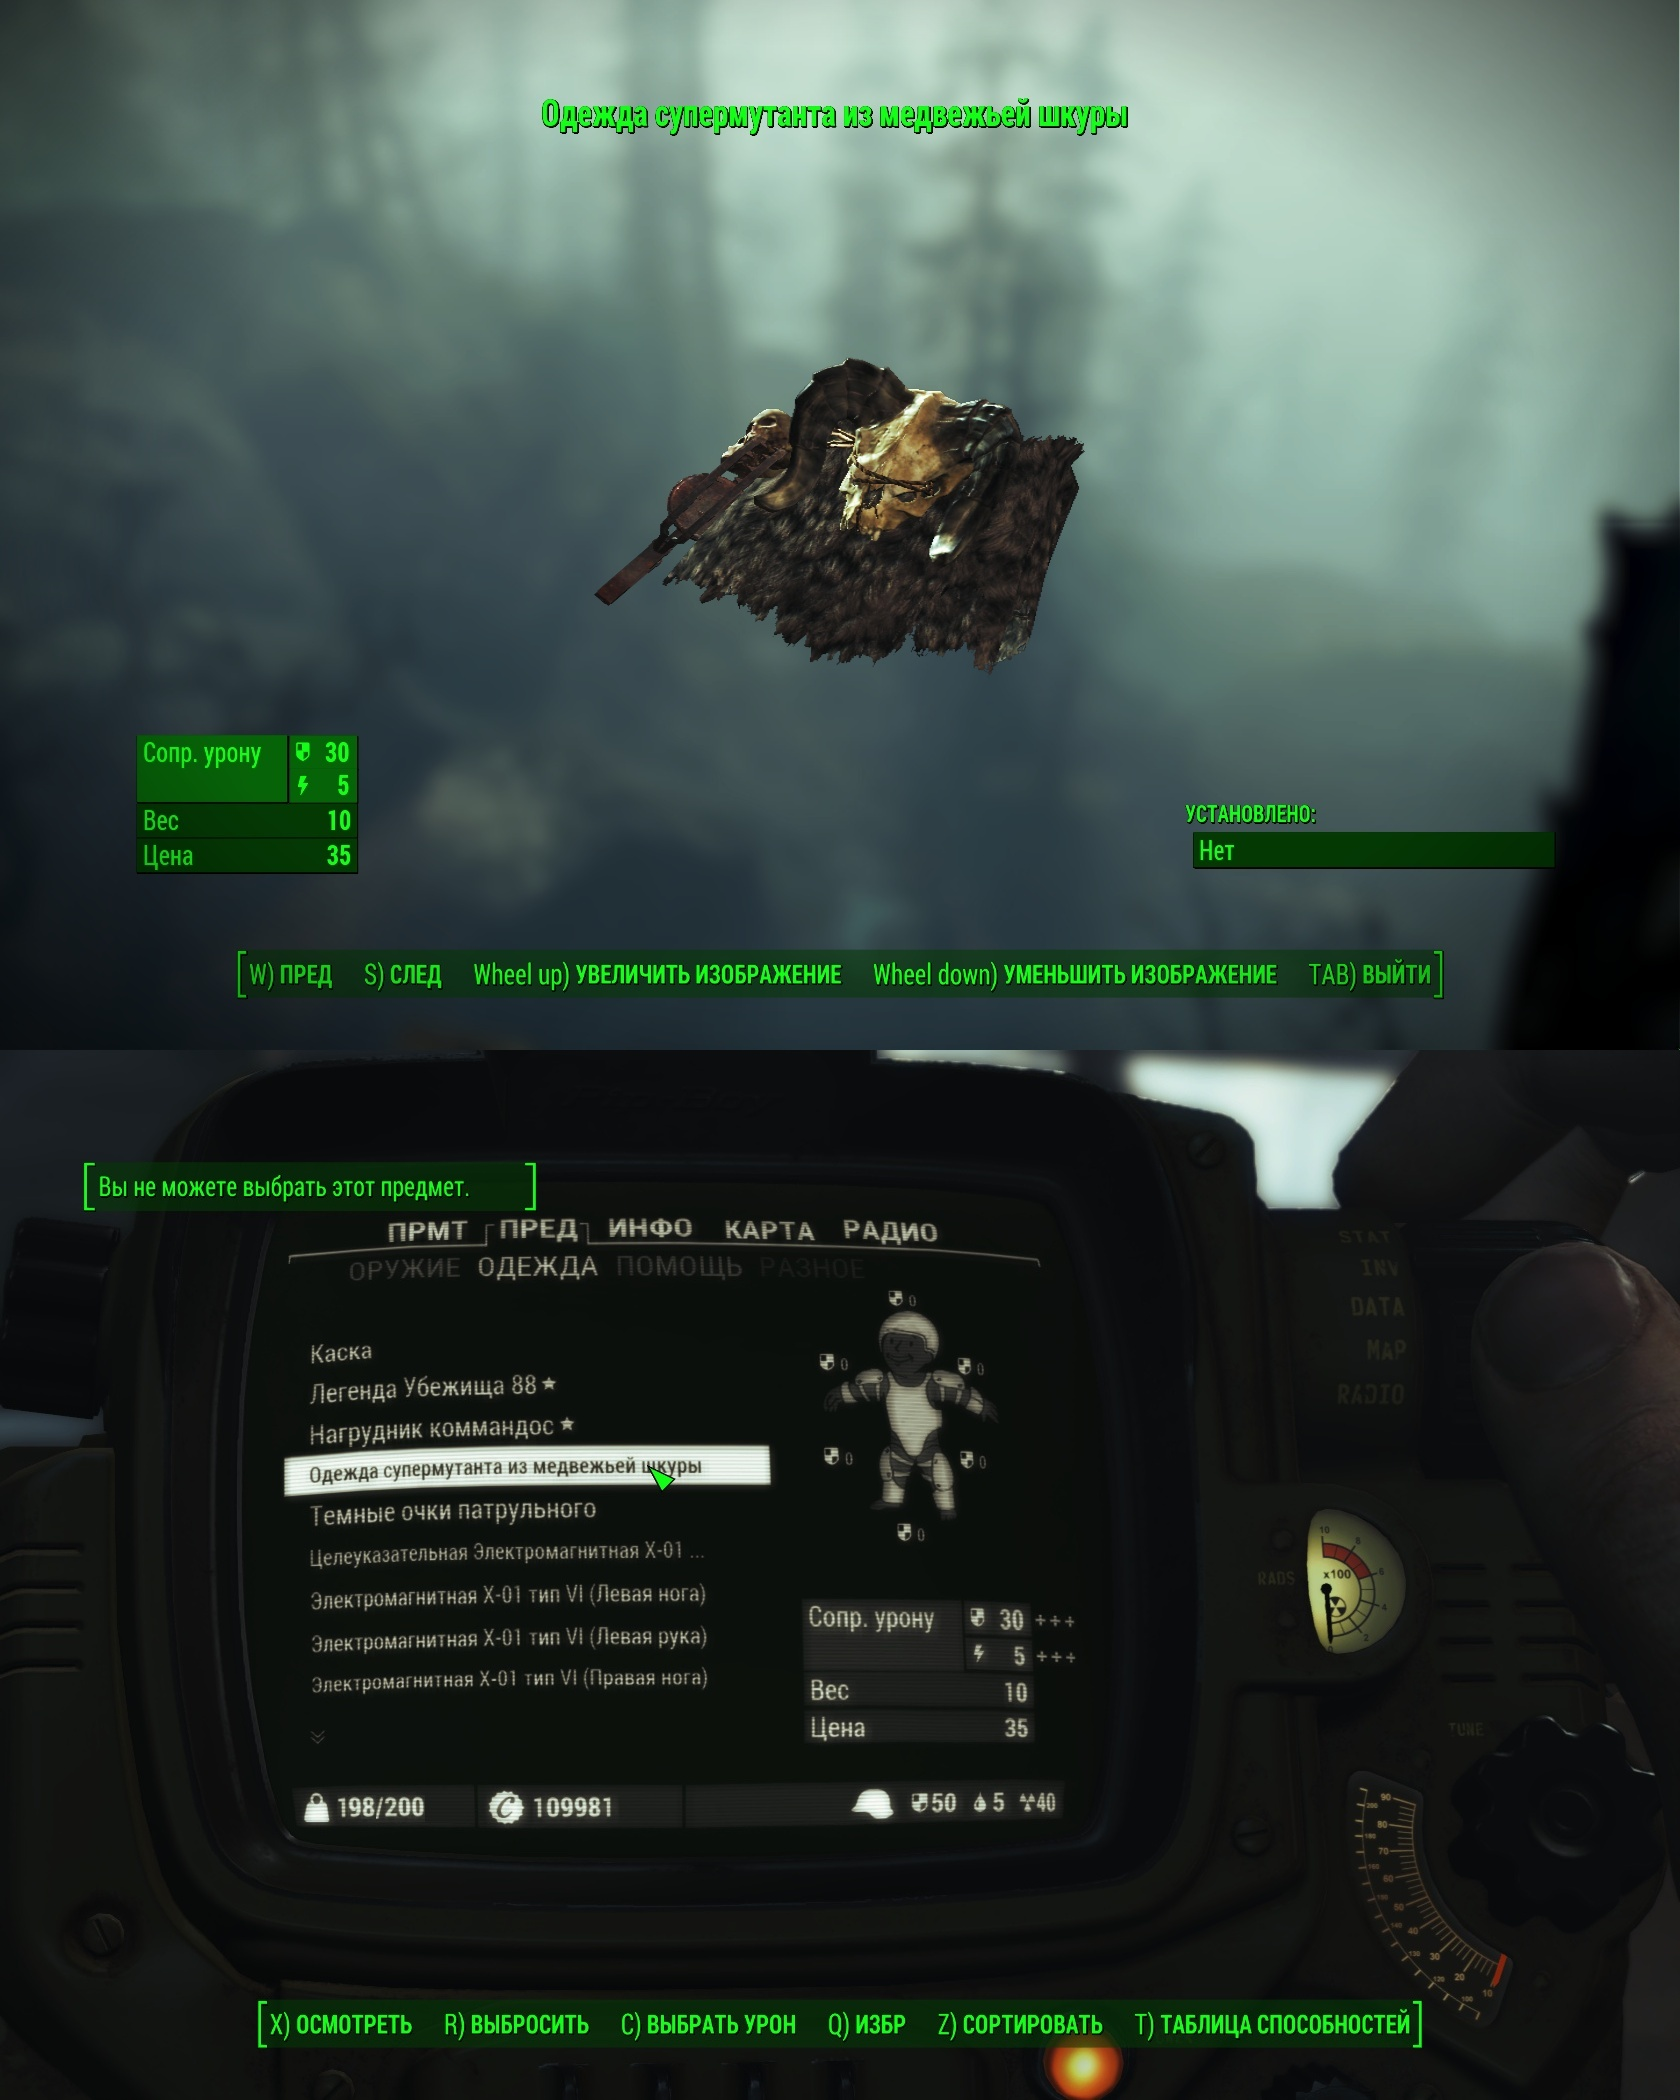 Одежда супермутанта из медвежьей шкуры (с супермутанта Эриксона) - Fallout 4 Одежда, Одежда супермутанта из медвежьей шкуры, Супермутант, Эриксон